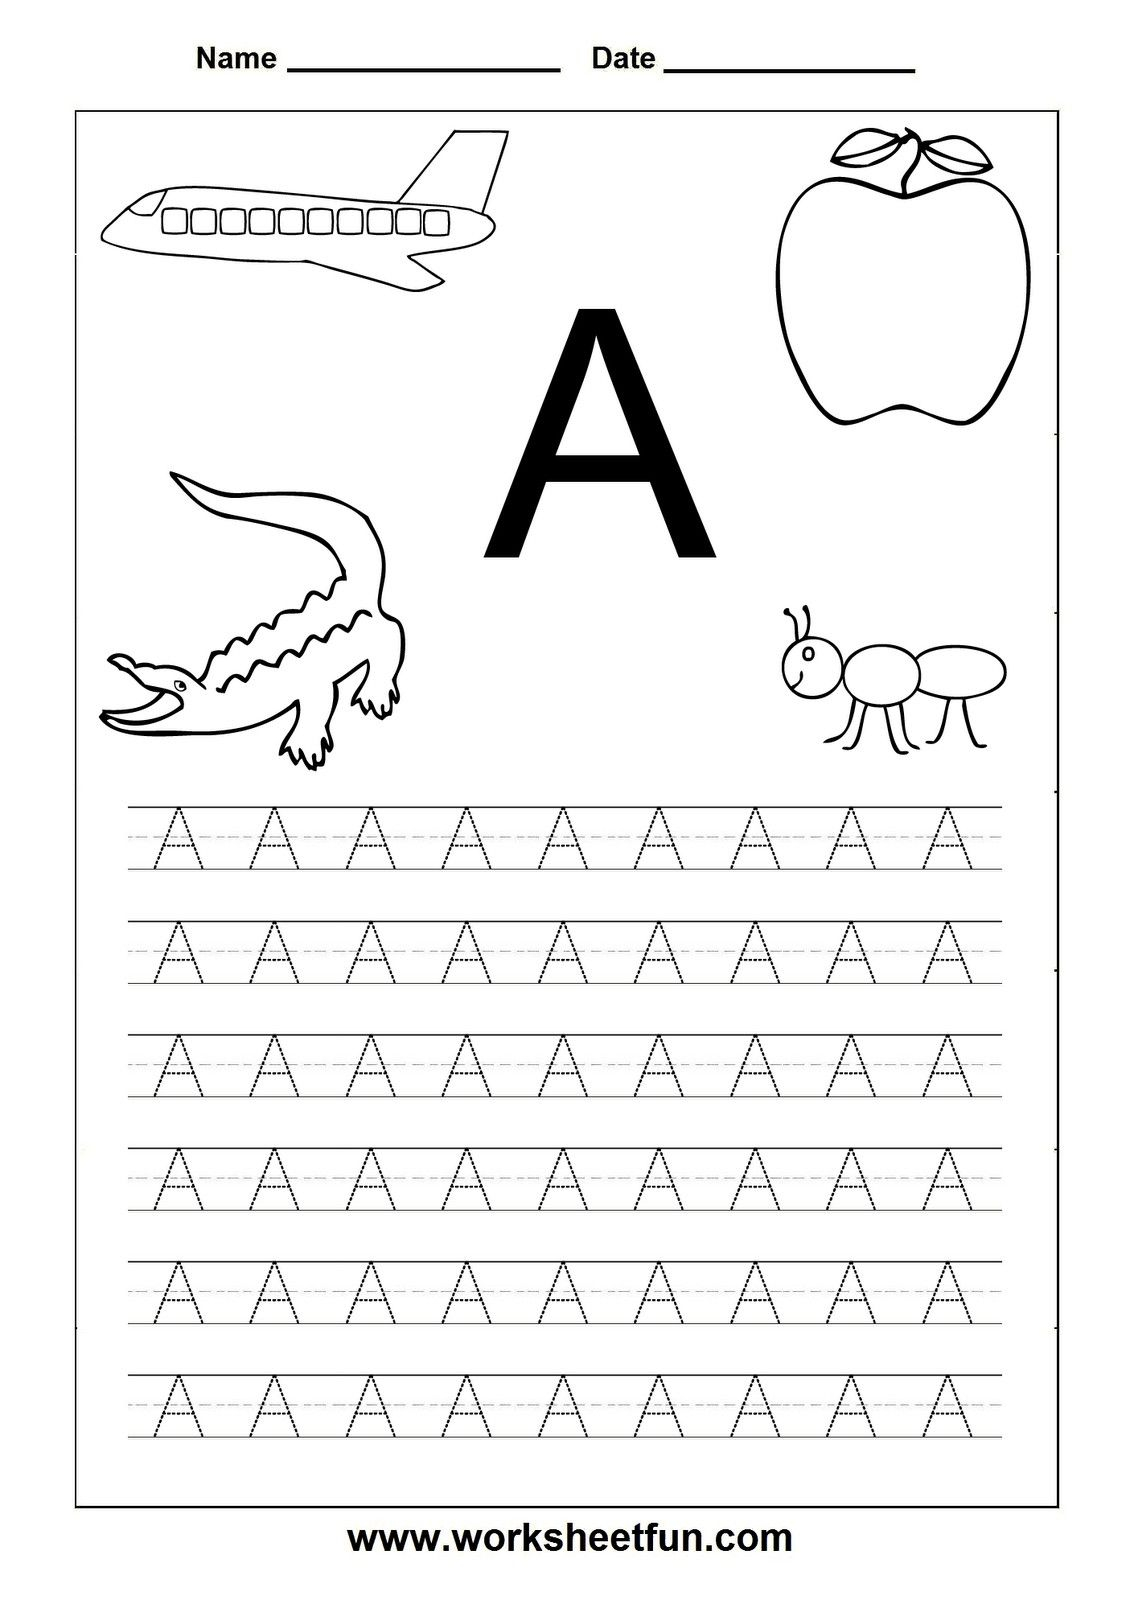 Free Print Preschool Worksheets Tracing Letters J